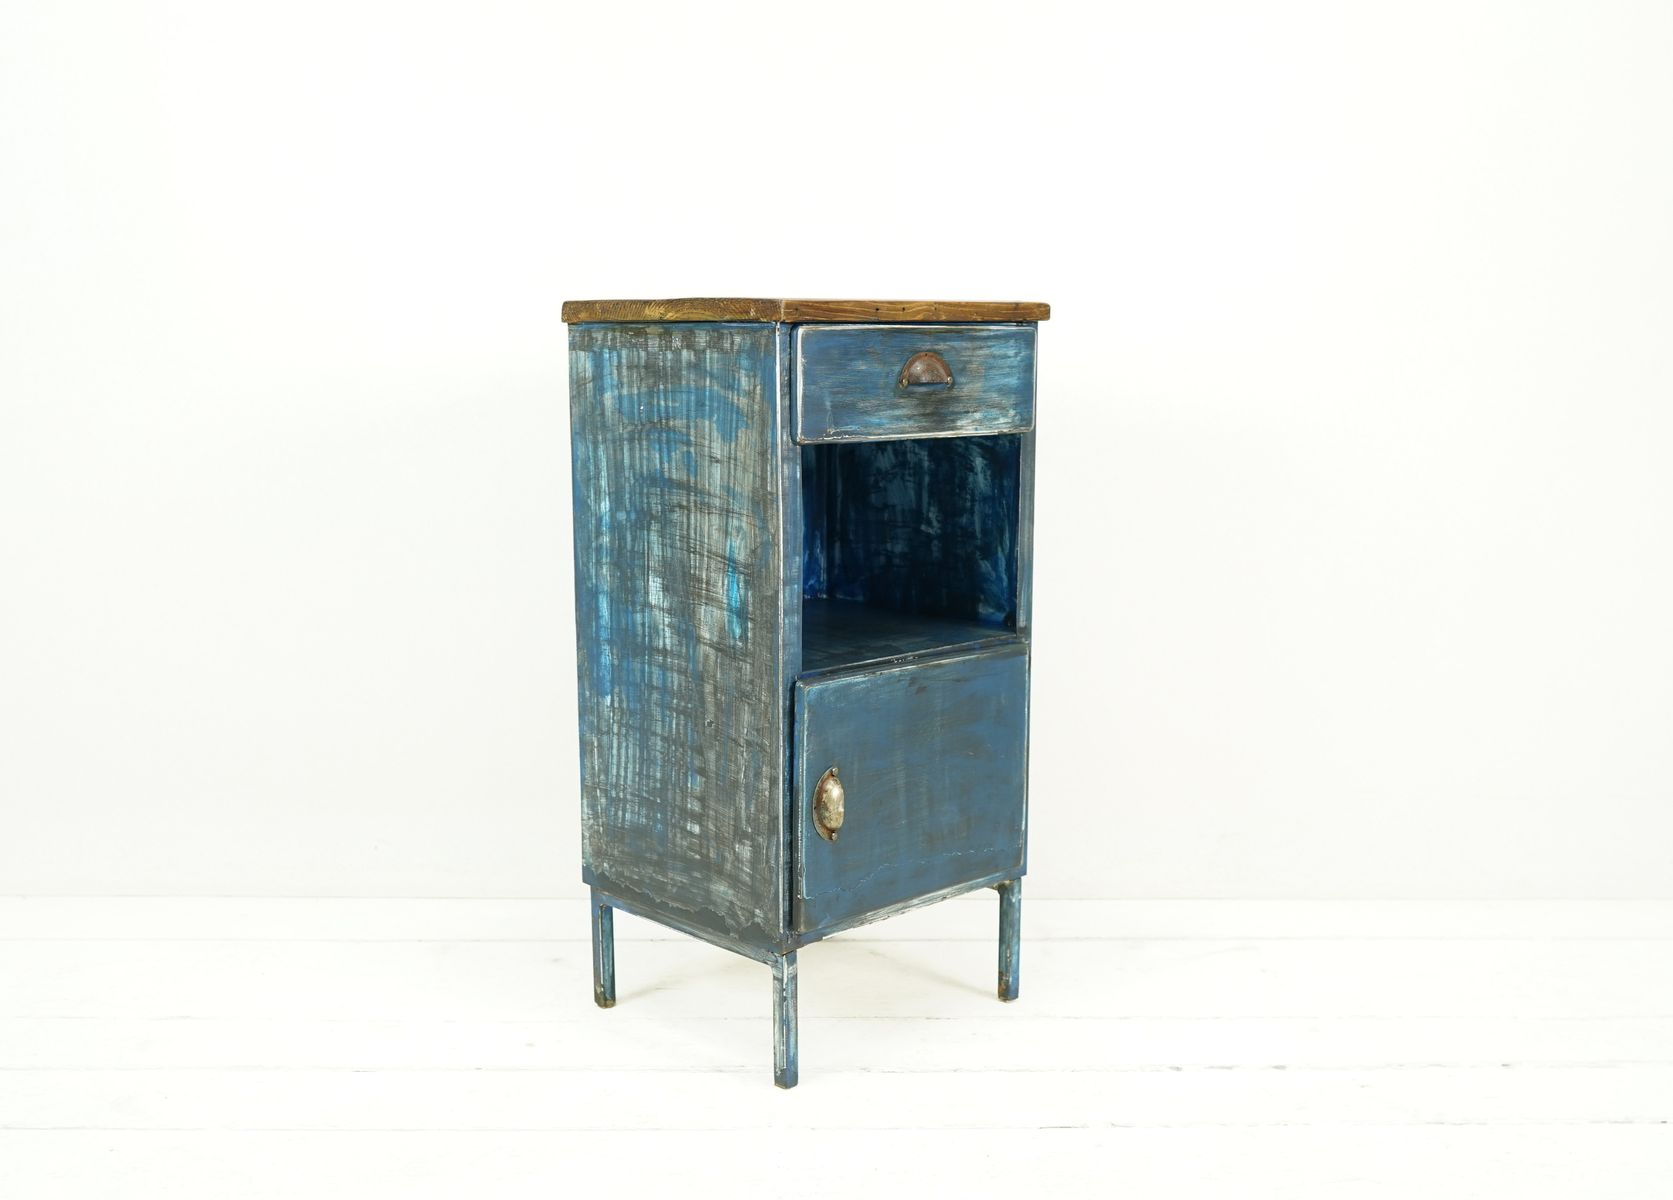 industrieller vintage fabrik schrank aus metall bei pamono. Black Bedroom Furniture Sets. Home Design Ideas